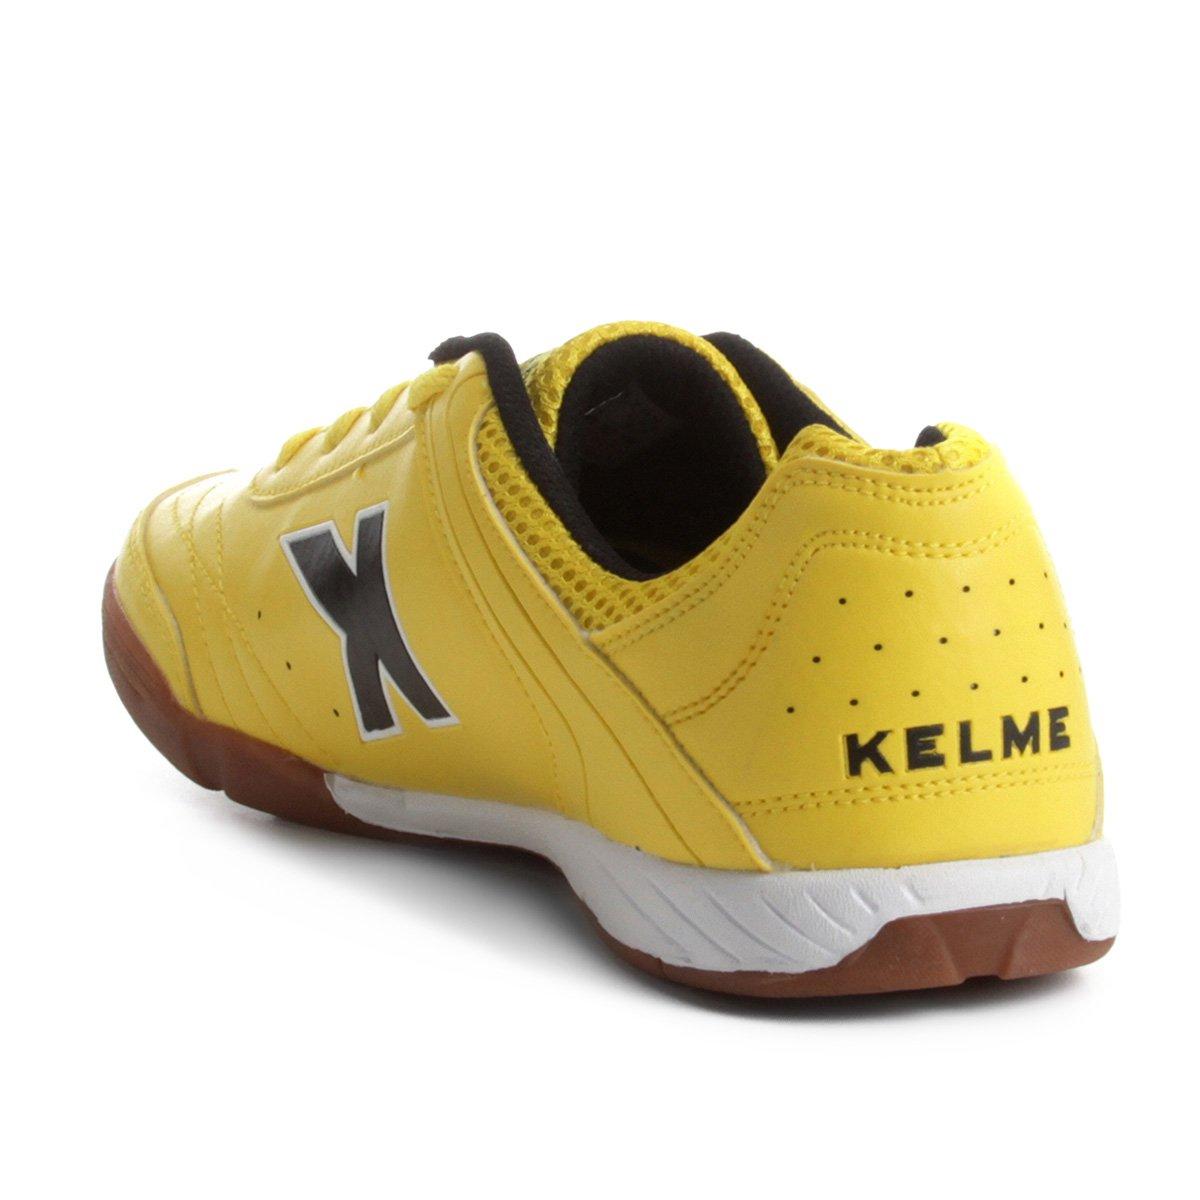 b806cfa289 Chuteira Futsal Kelme Precision Trn - Amarelo e Preto - Compre Agora ...